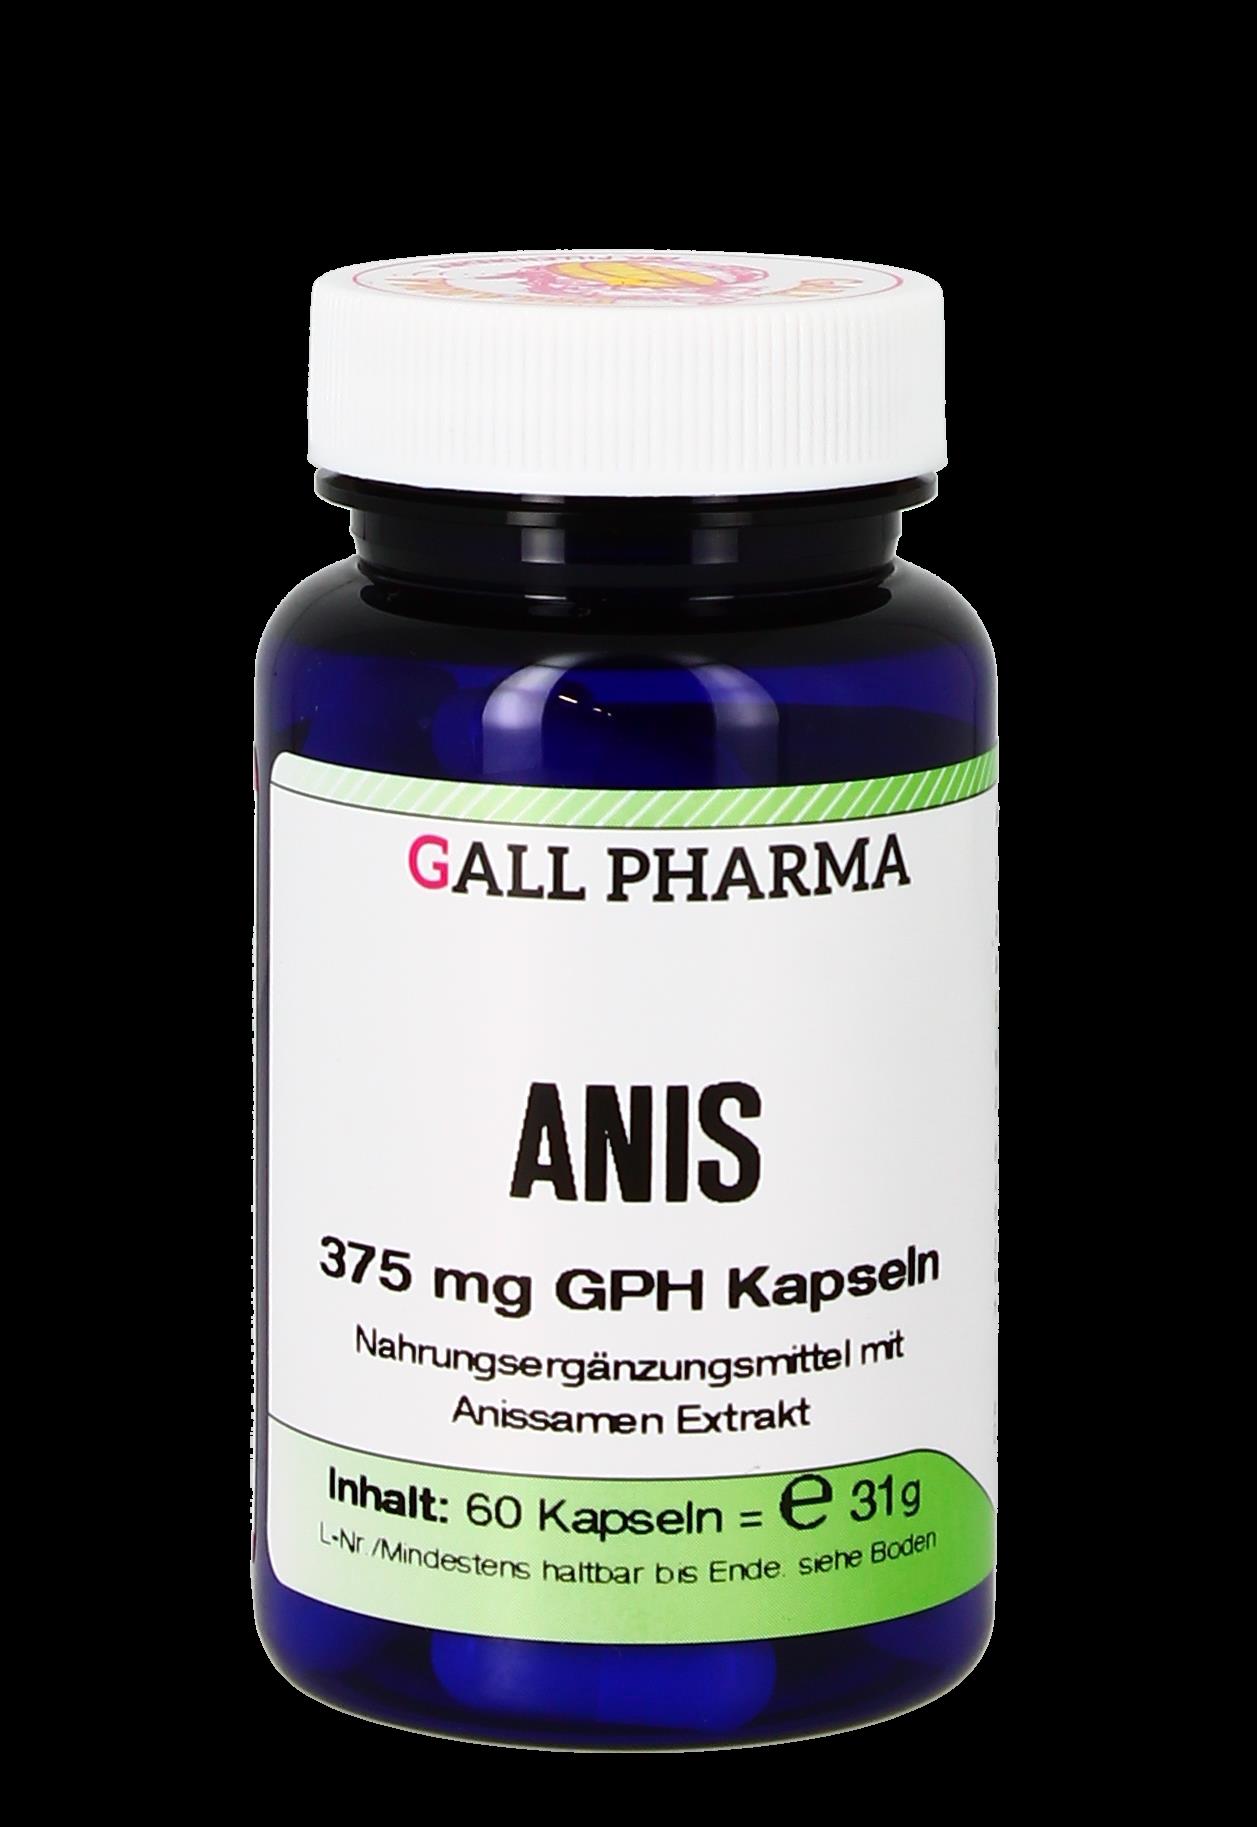 Anis 375 mg GPH Kapseln